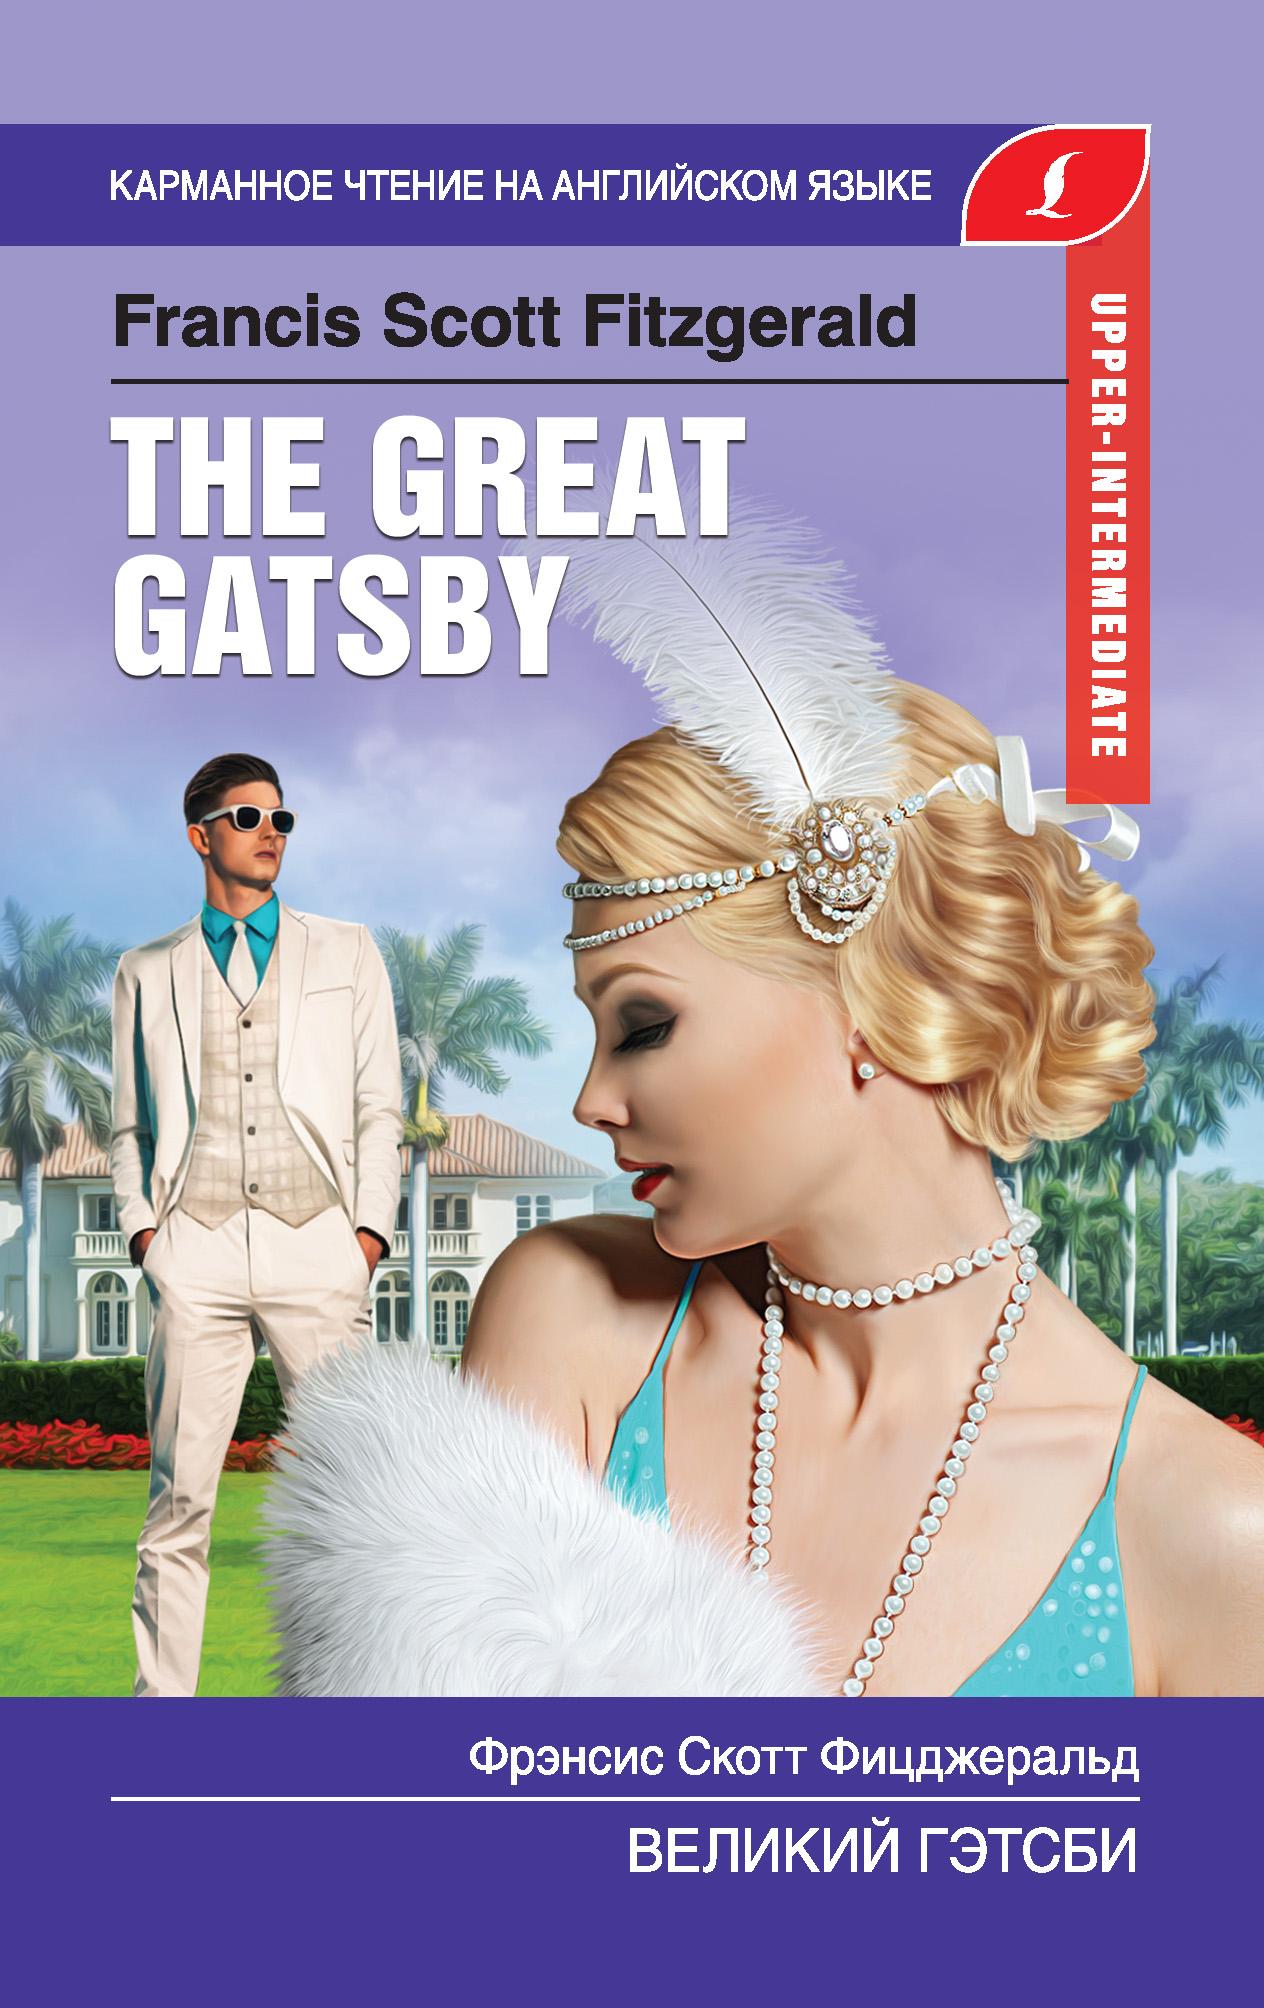 все цены на Френсис Скотт Фицджеральд Великий Гэтсби / The Great Gatsby онлайн